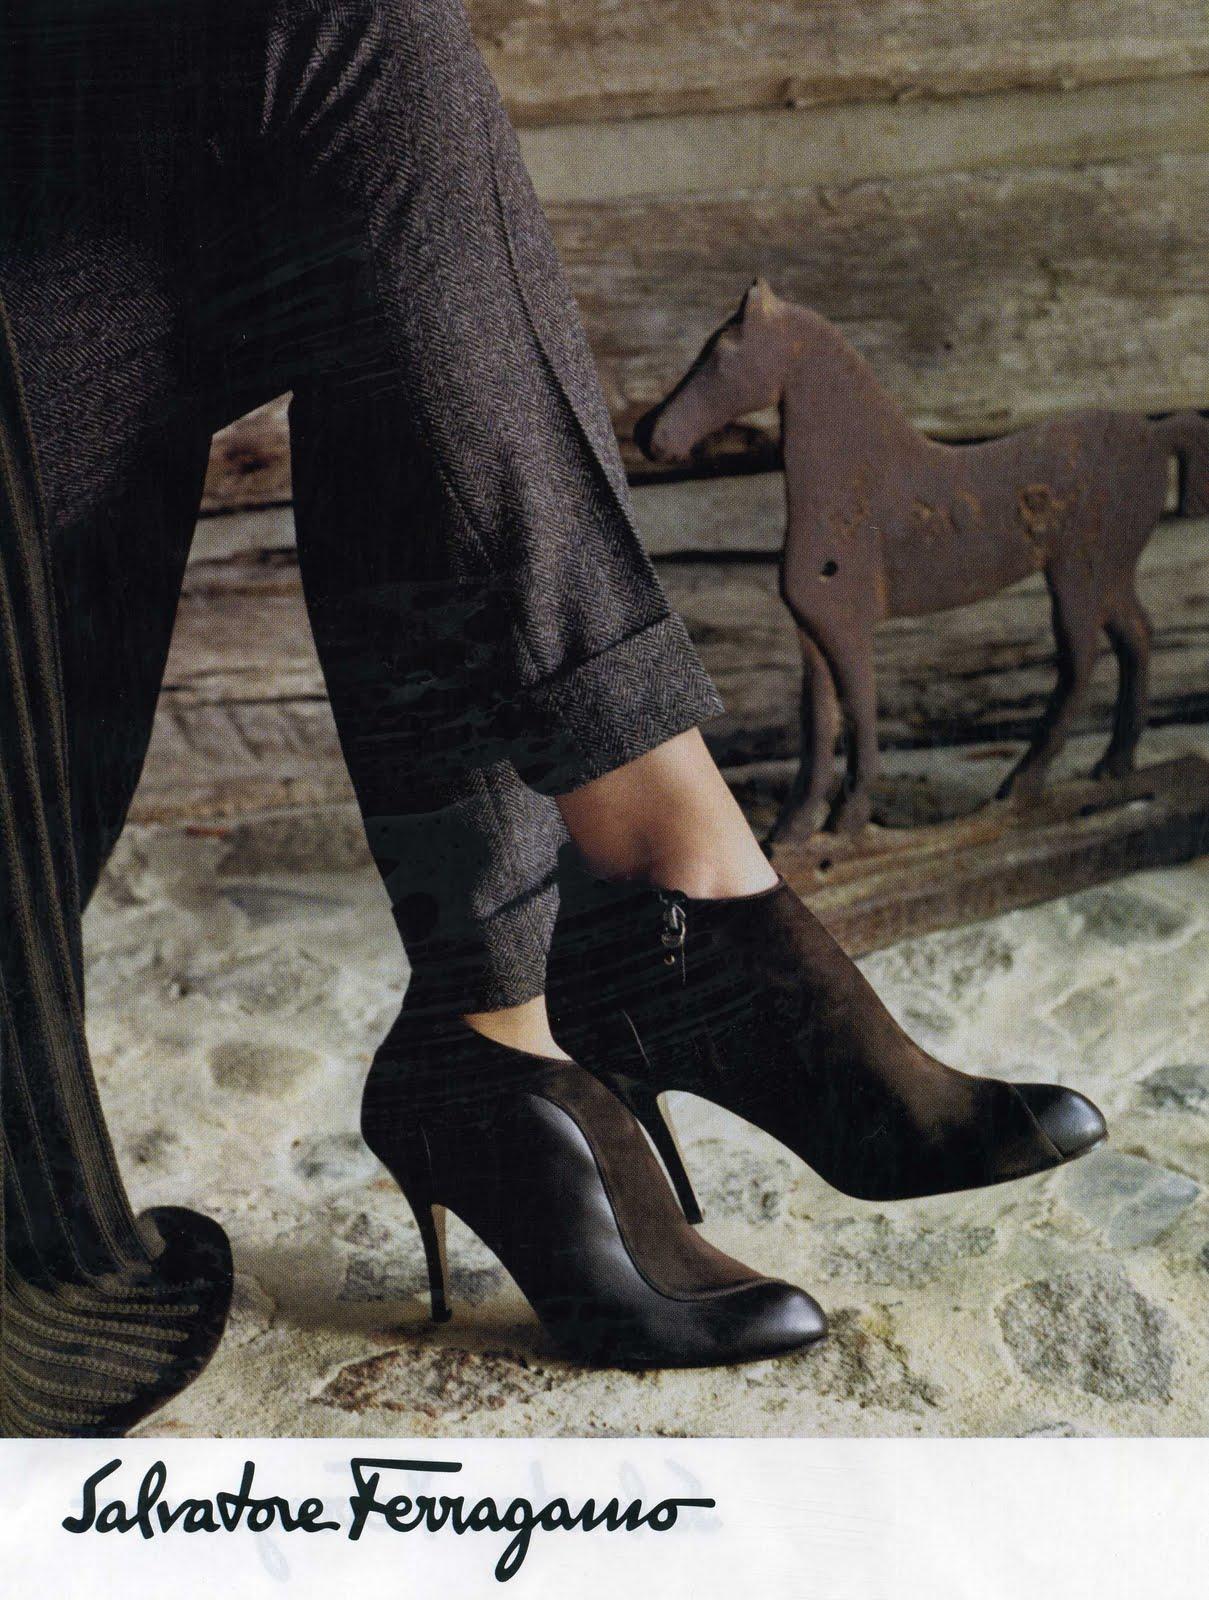 http://3.bp.blogspot.com/_Ek3cchny-Xw/TKyeCk7OBhI/AAAAAAAABhs/6ma5K-G6Rw8/s1600/Equestrian+Fashion+BAZAAR+2010080.jpg